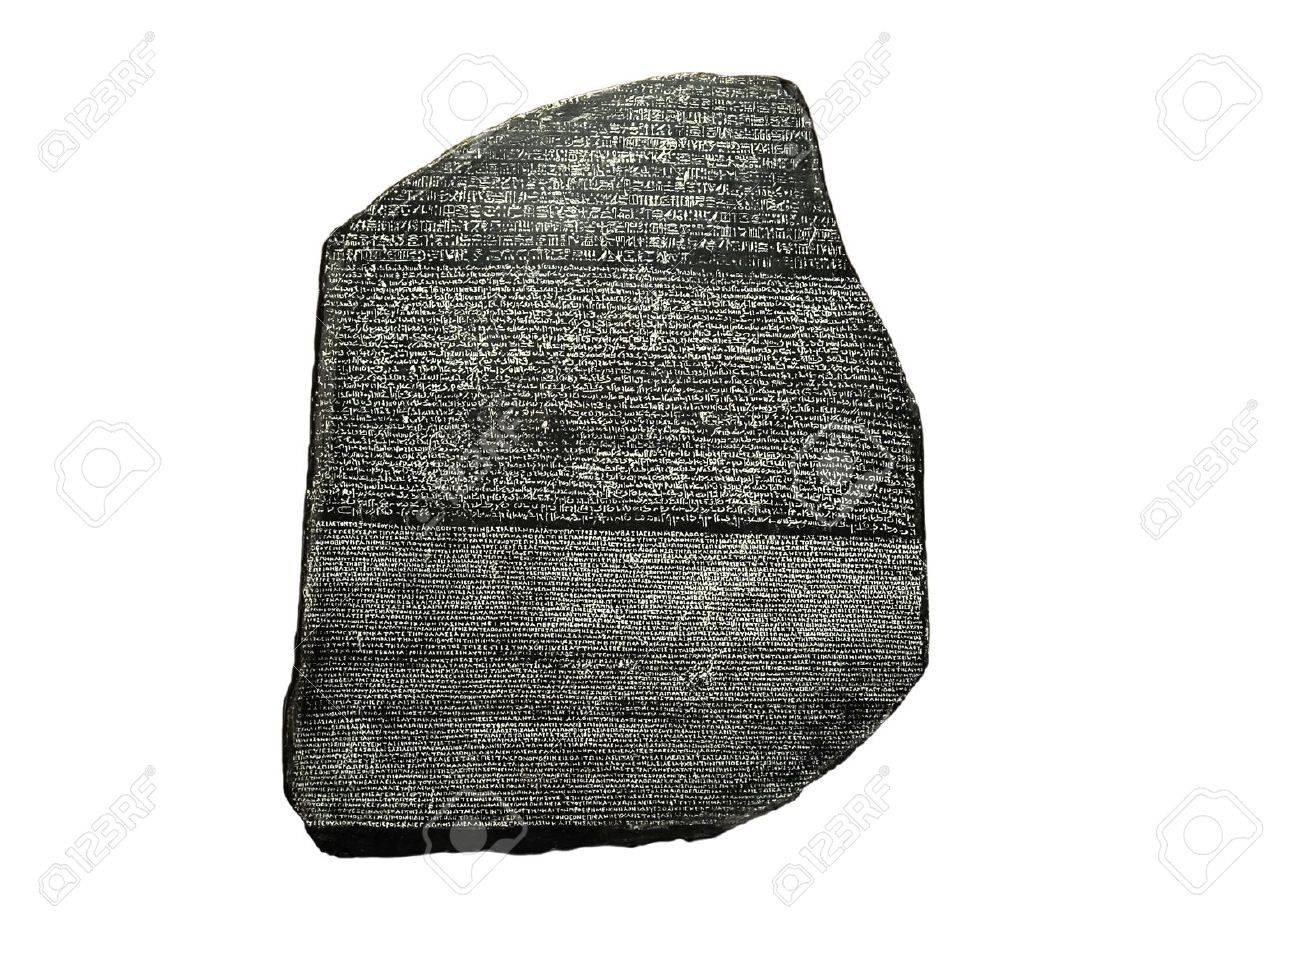 Rosetta stone on white background Stock Photo - 8949317